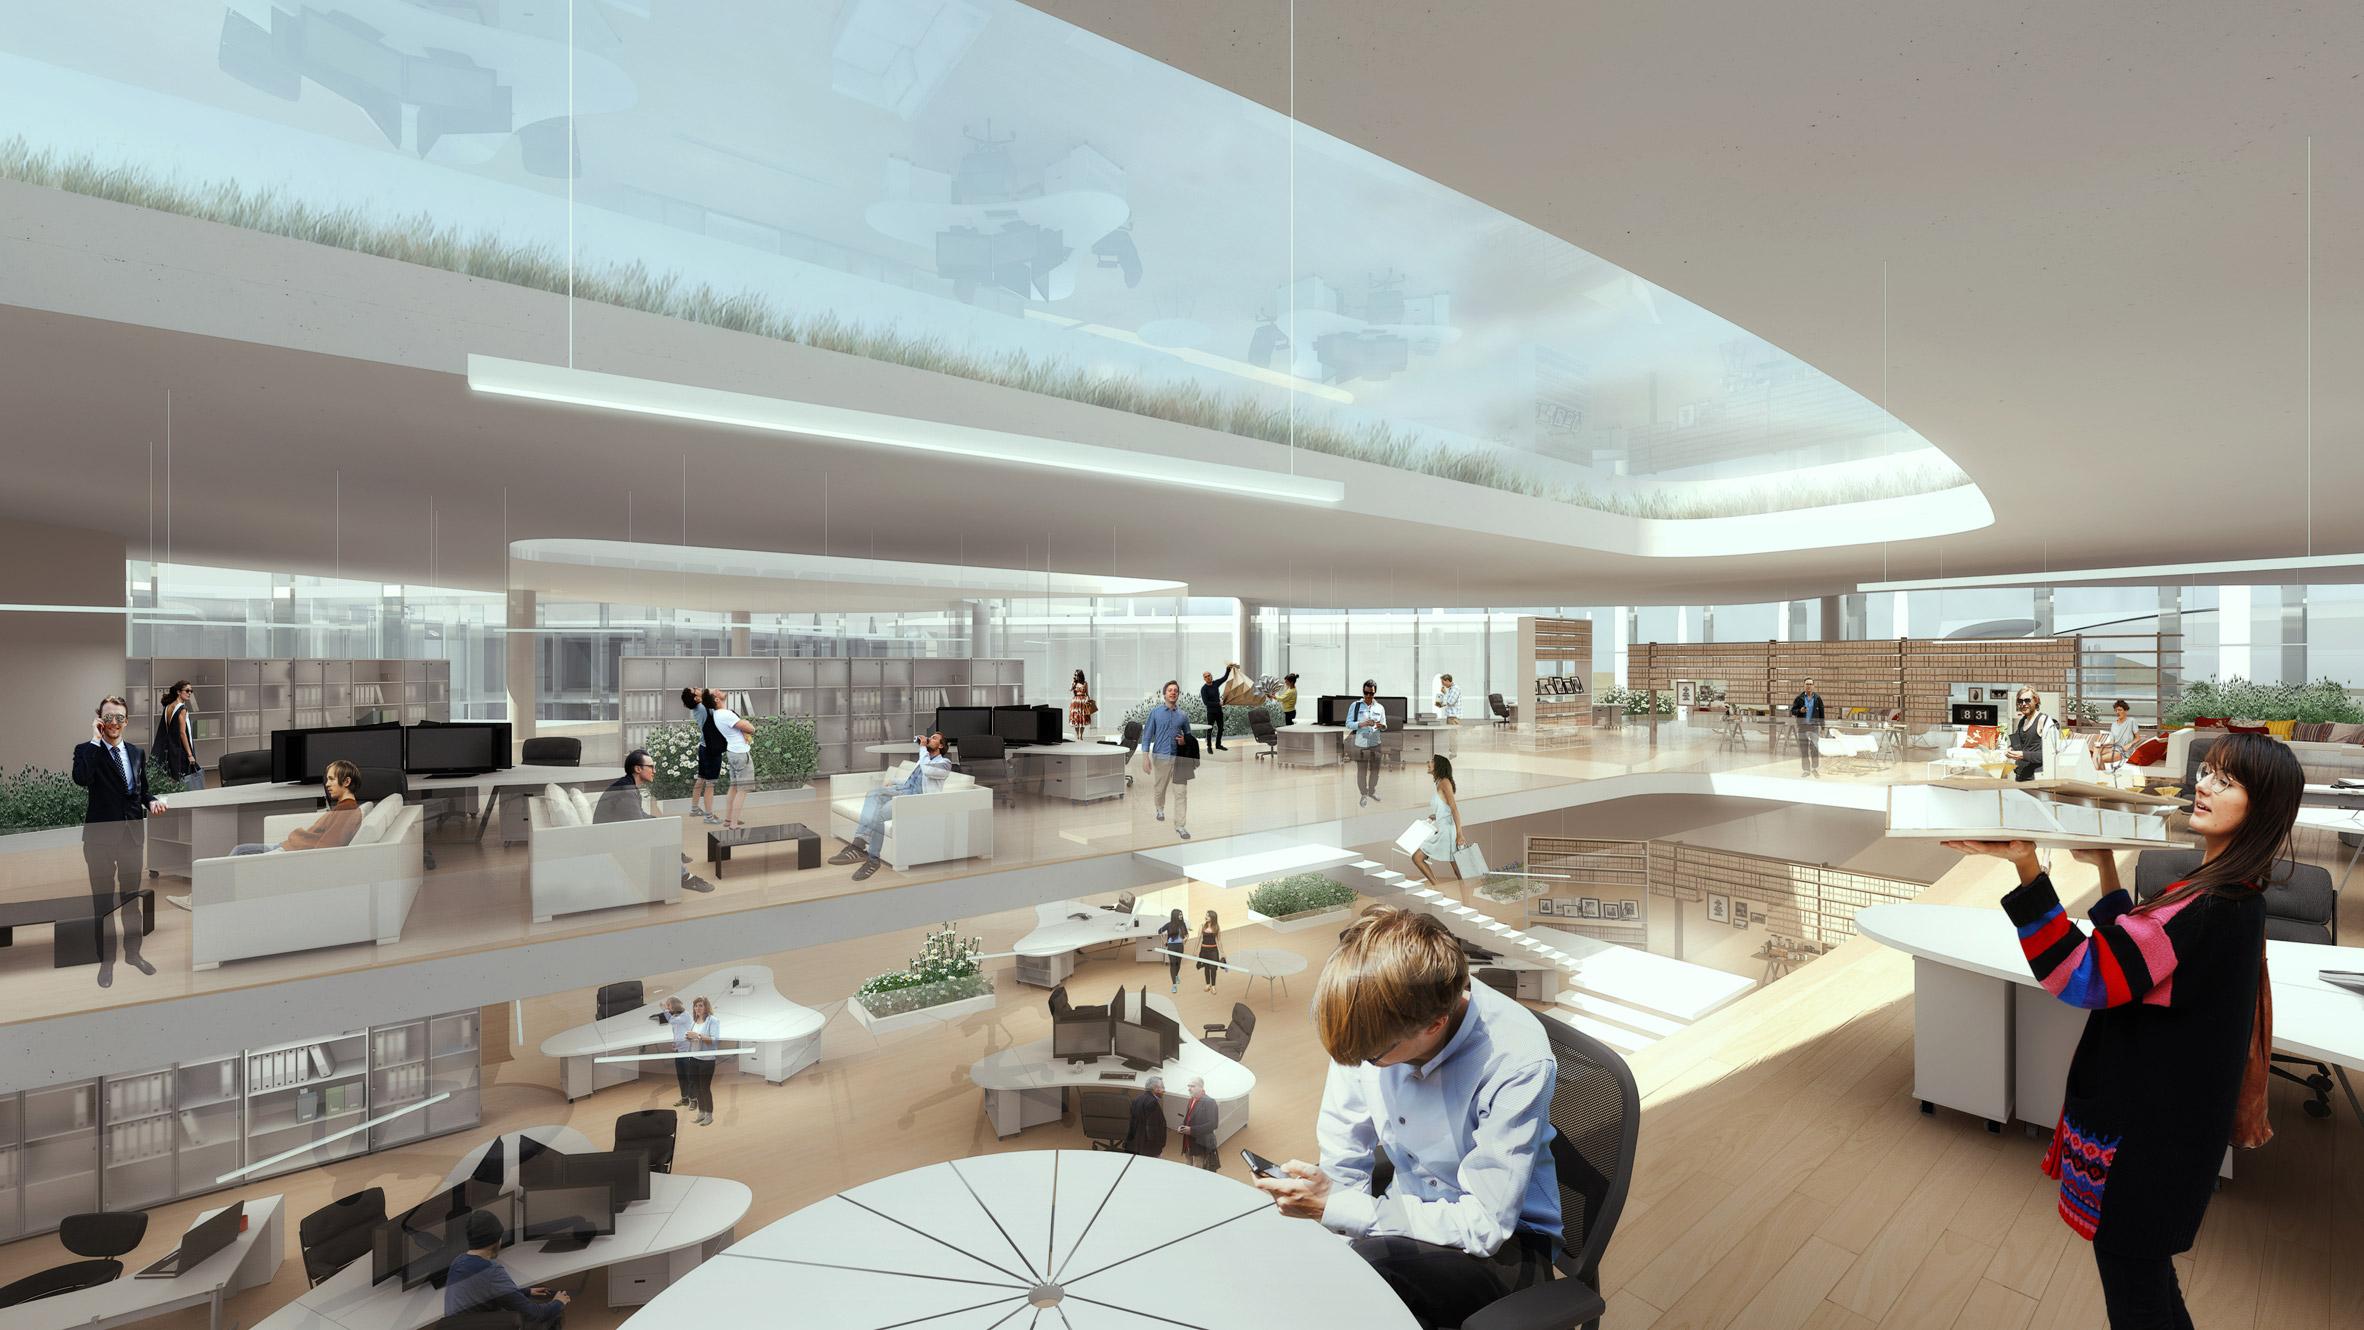 Faraday Future headquarters by MAD Architects